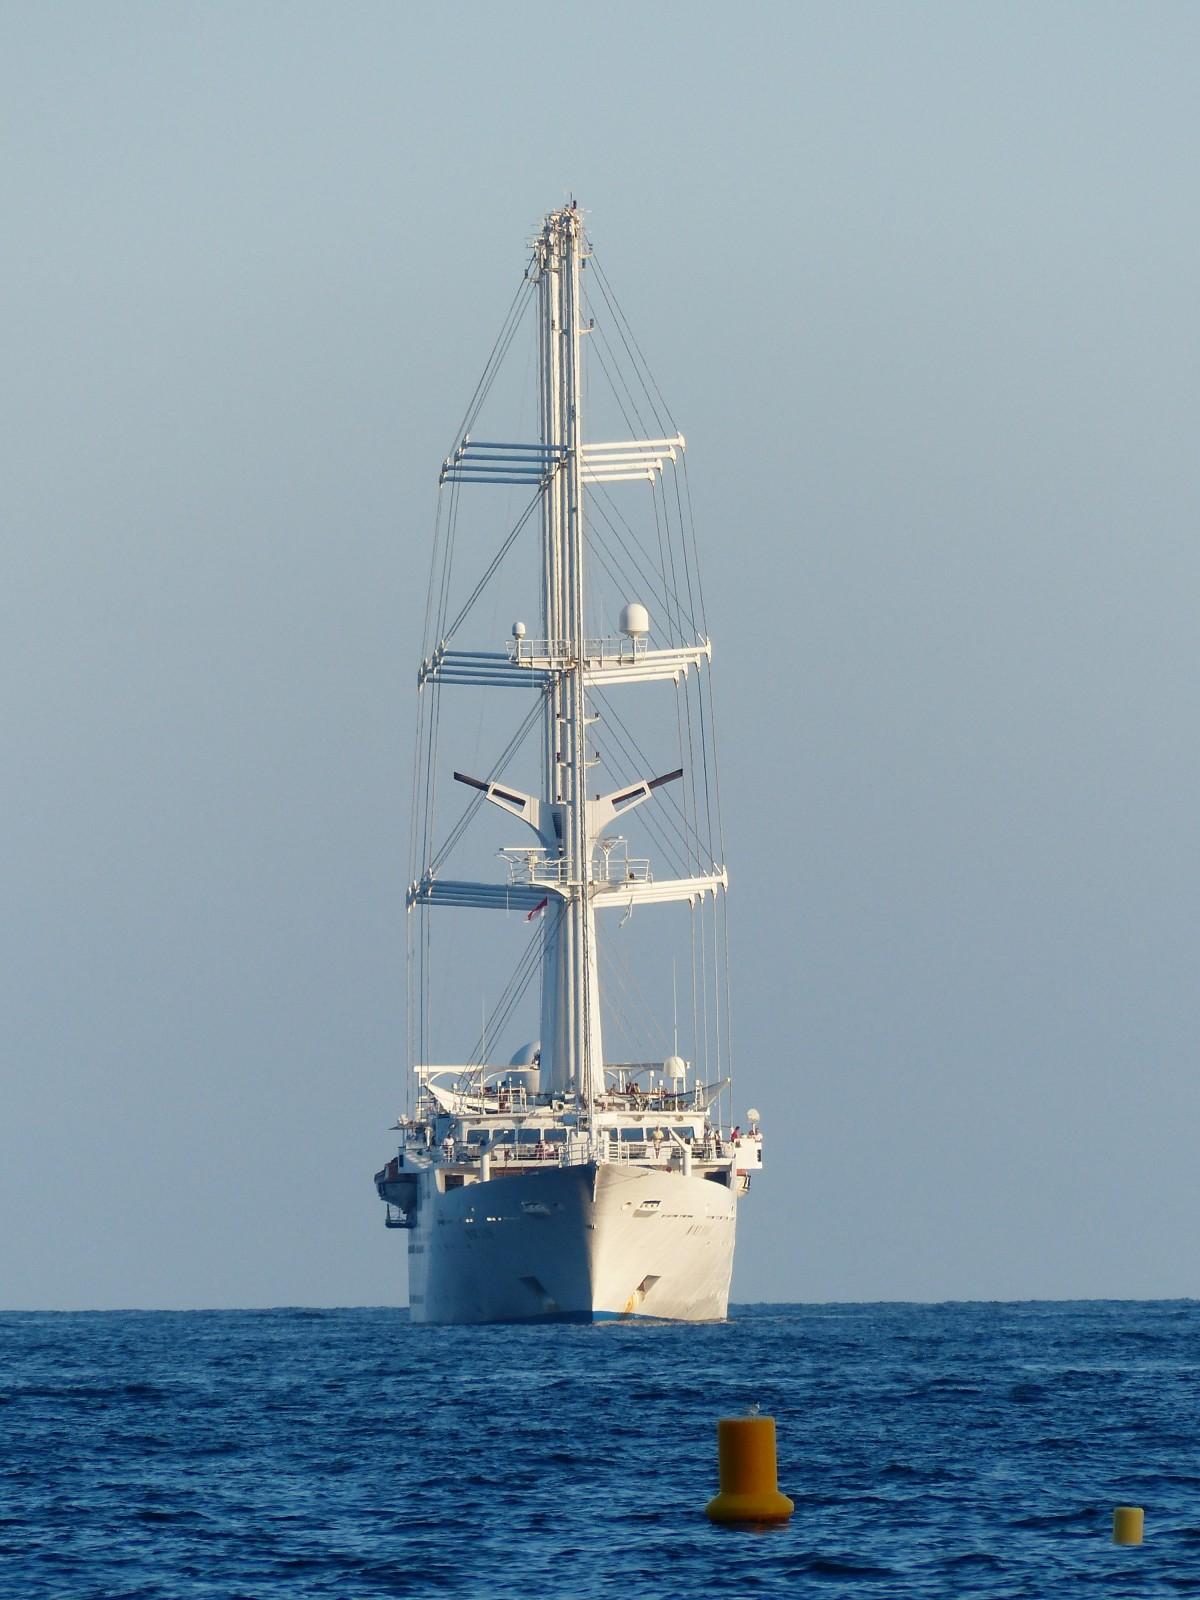 Free Images : sea, water, ocean, sky, boat, cloudy, wind ...